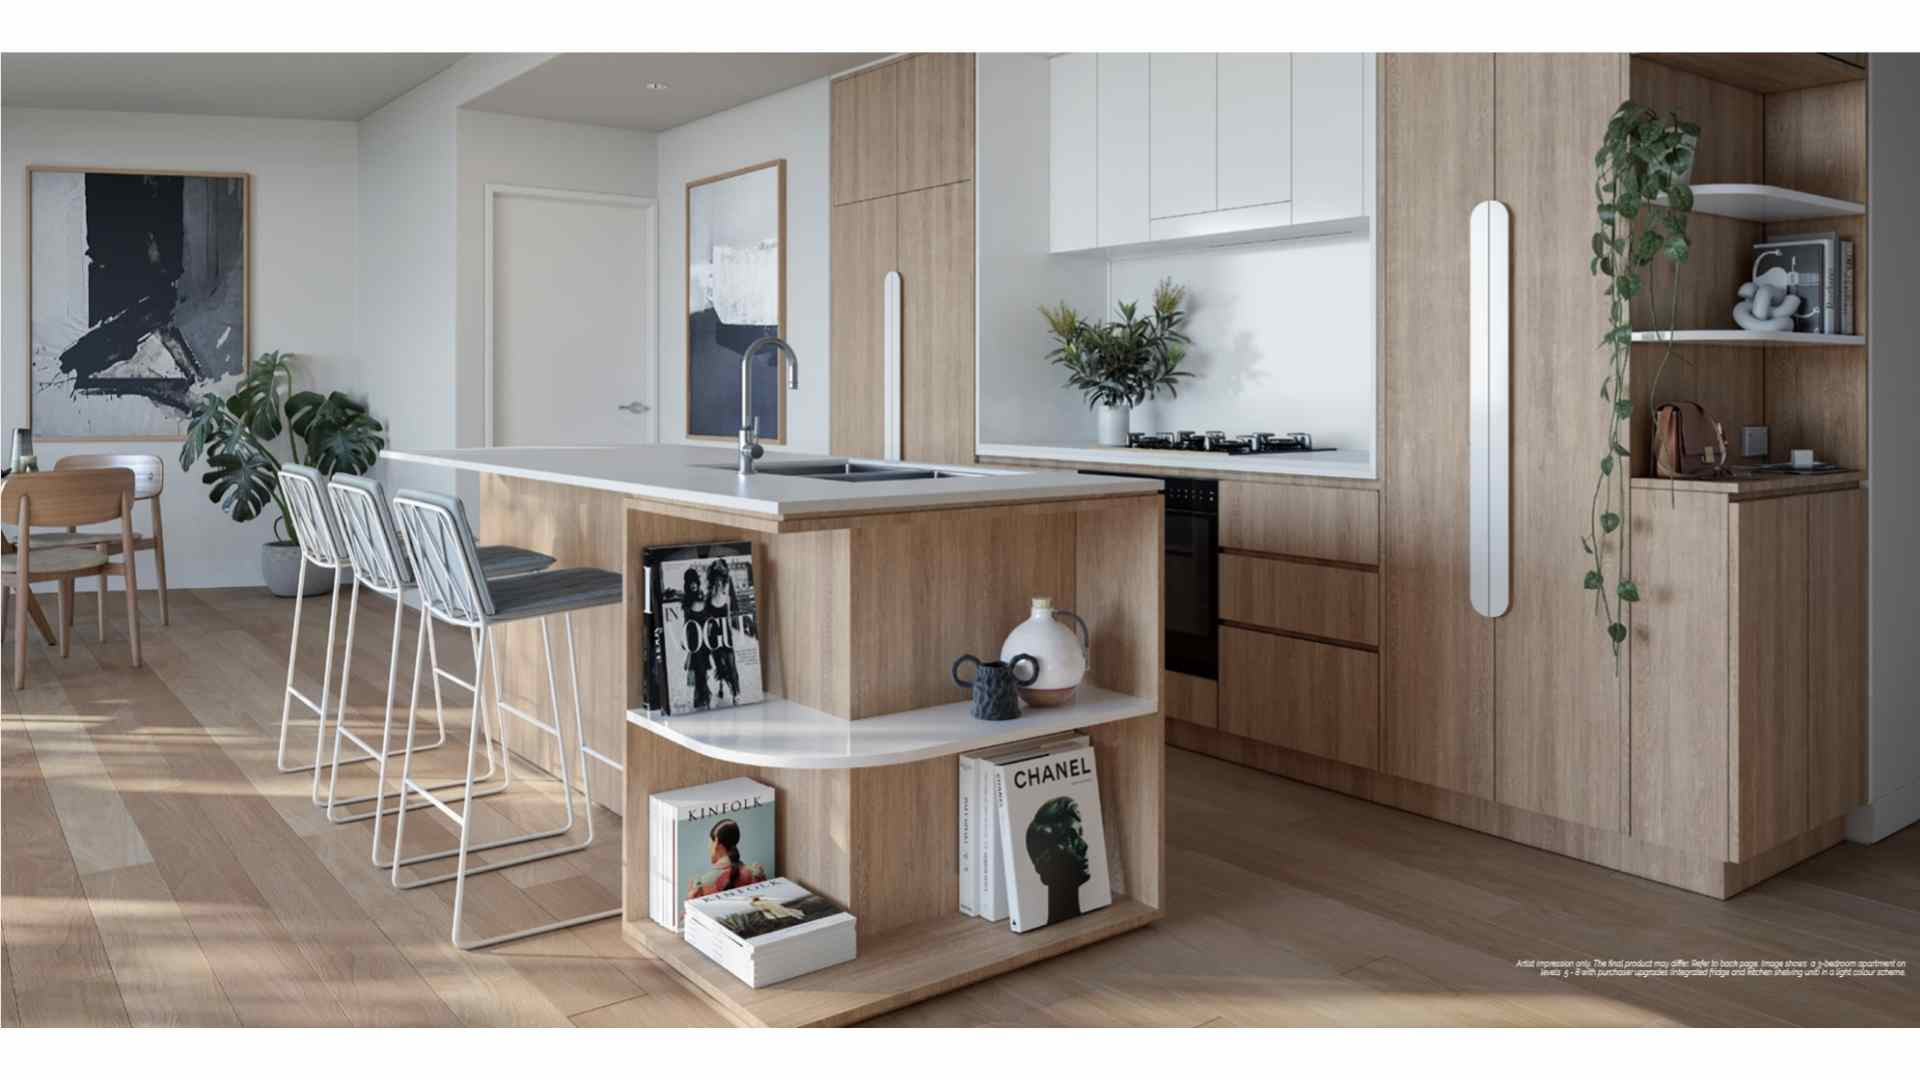 white and beige kitchen, white countertop